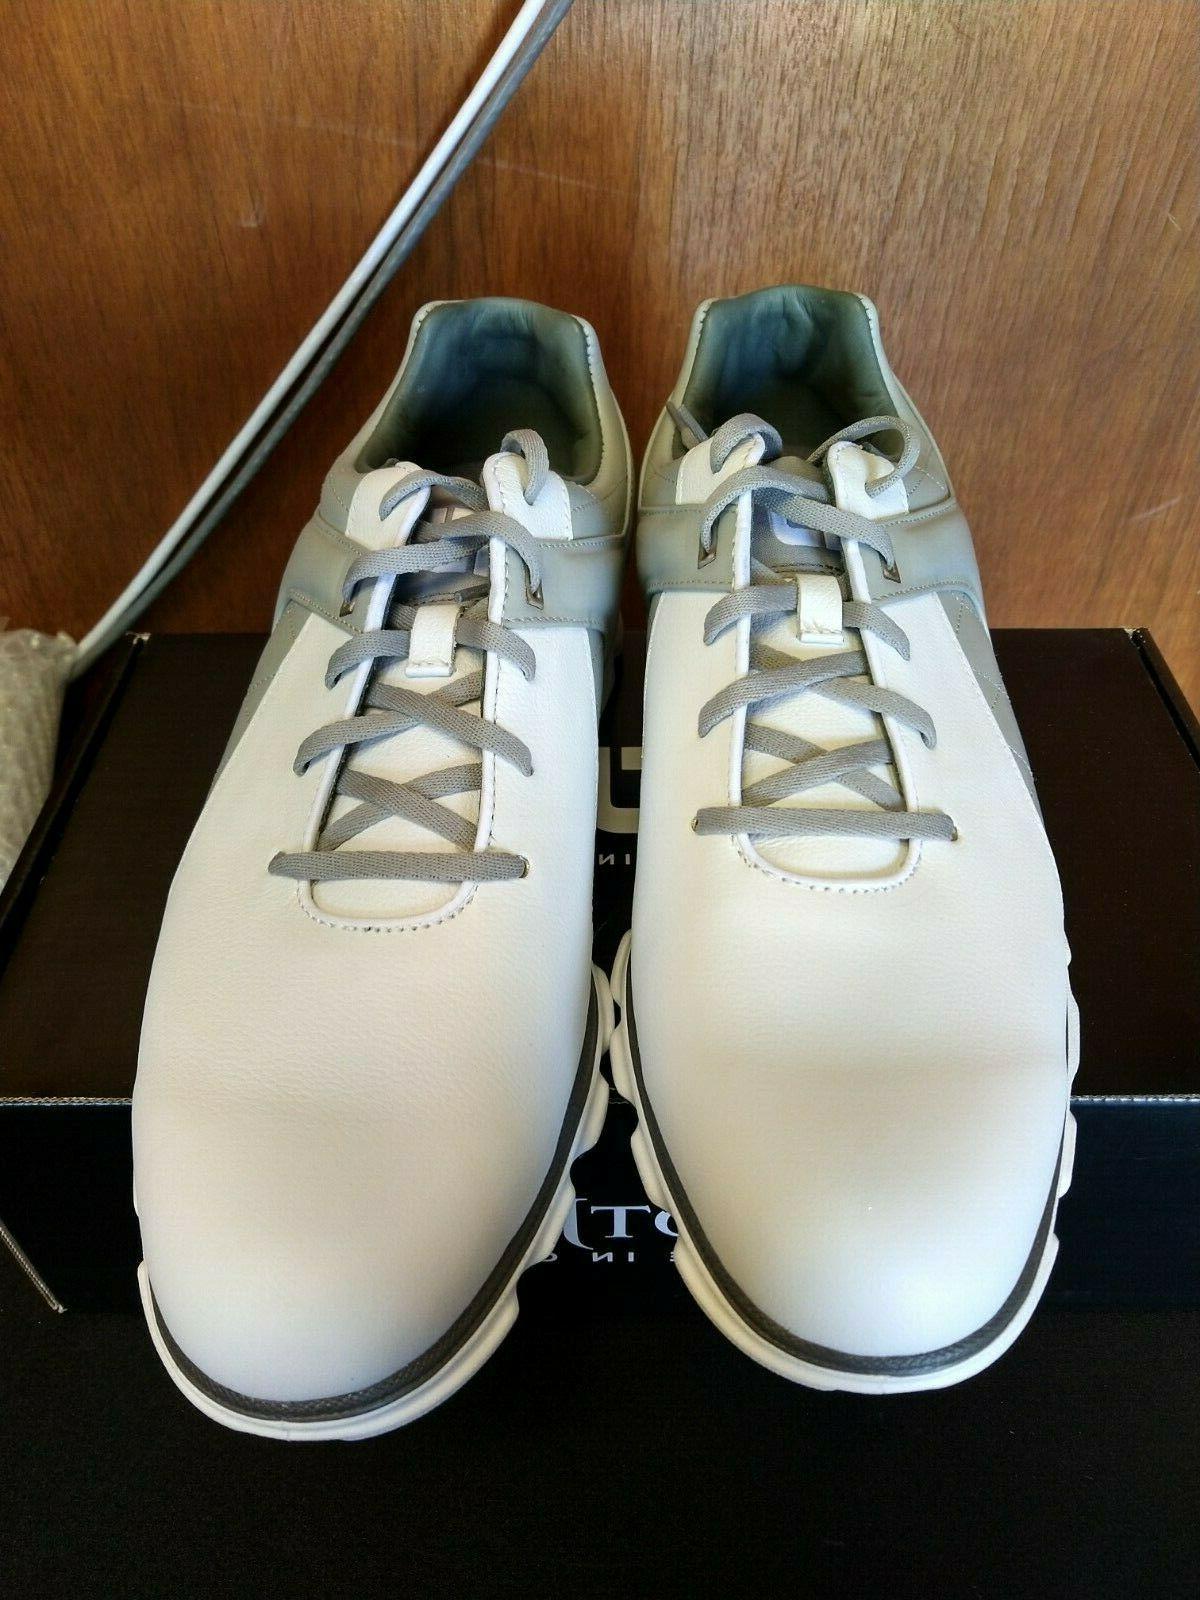 FootJoy Golf Shoes US 11.5